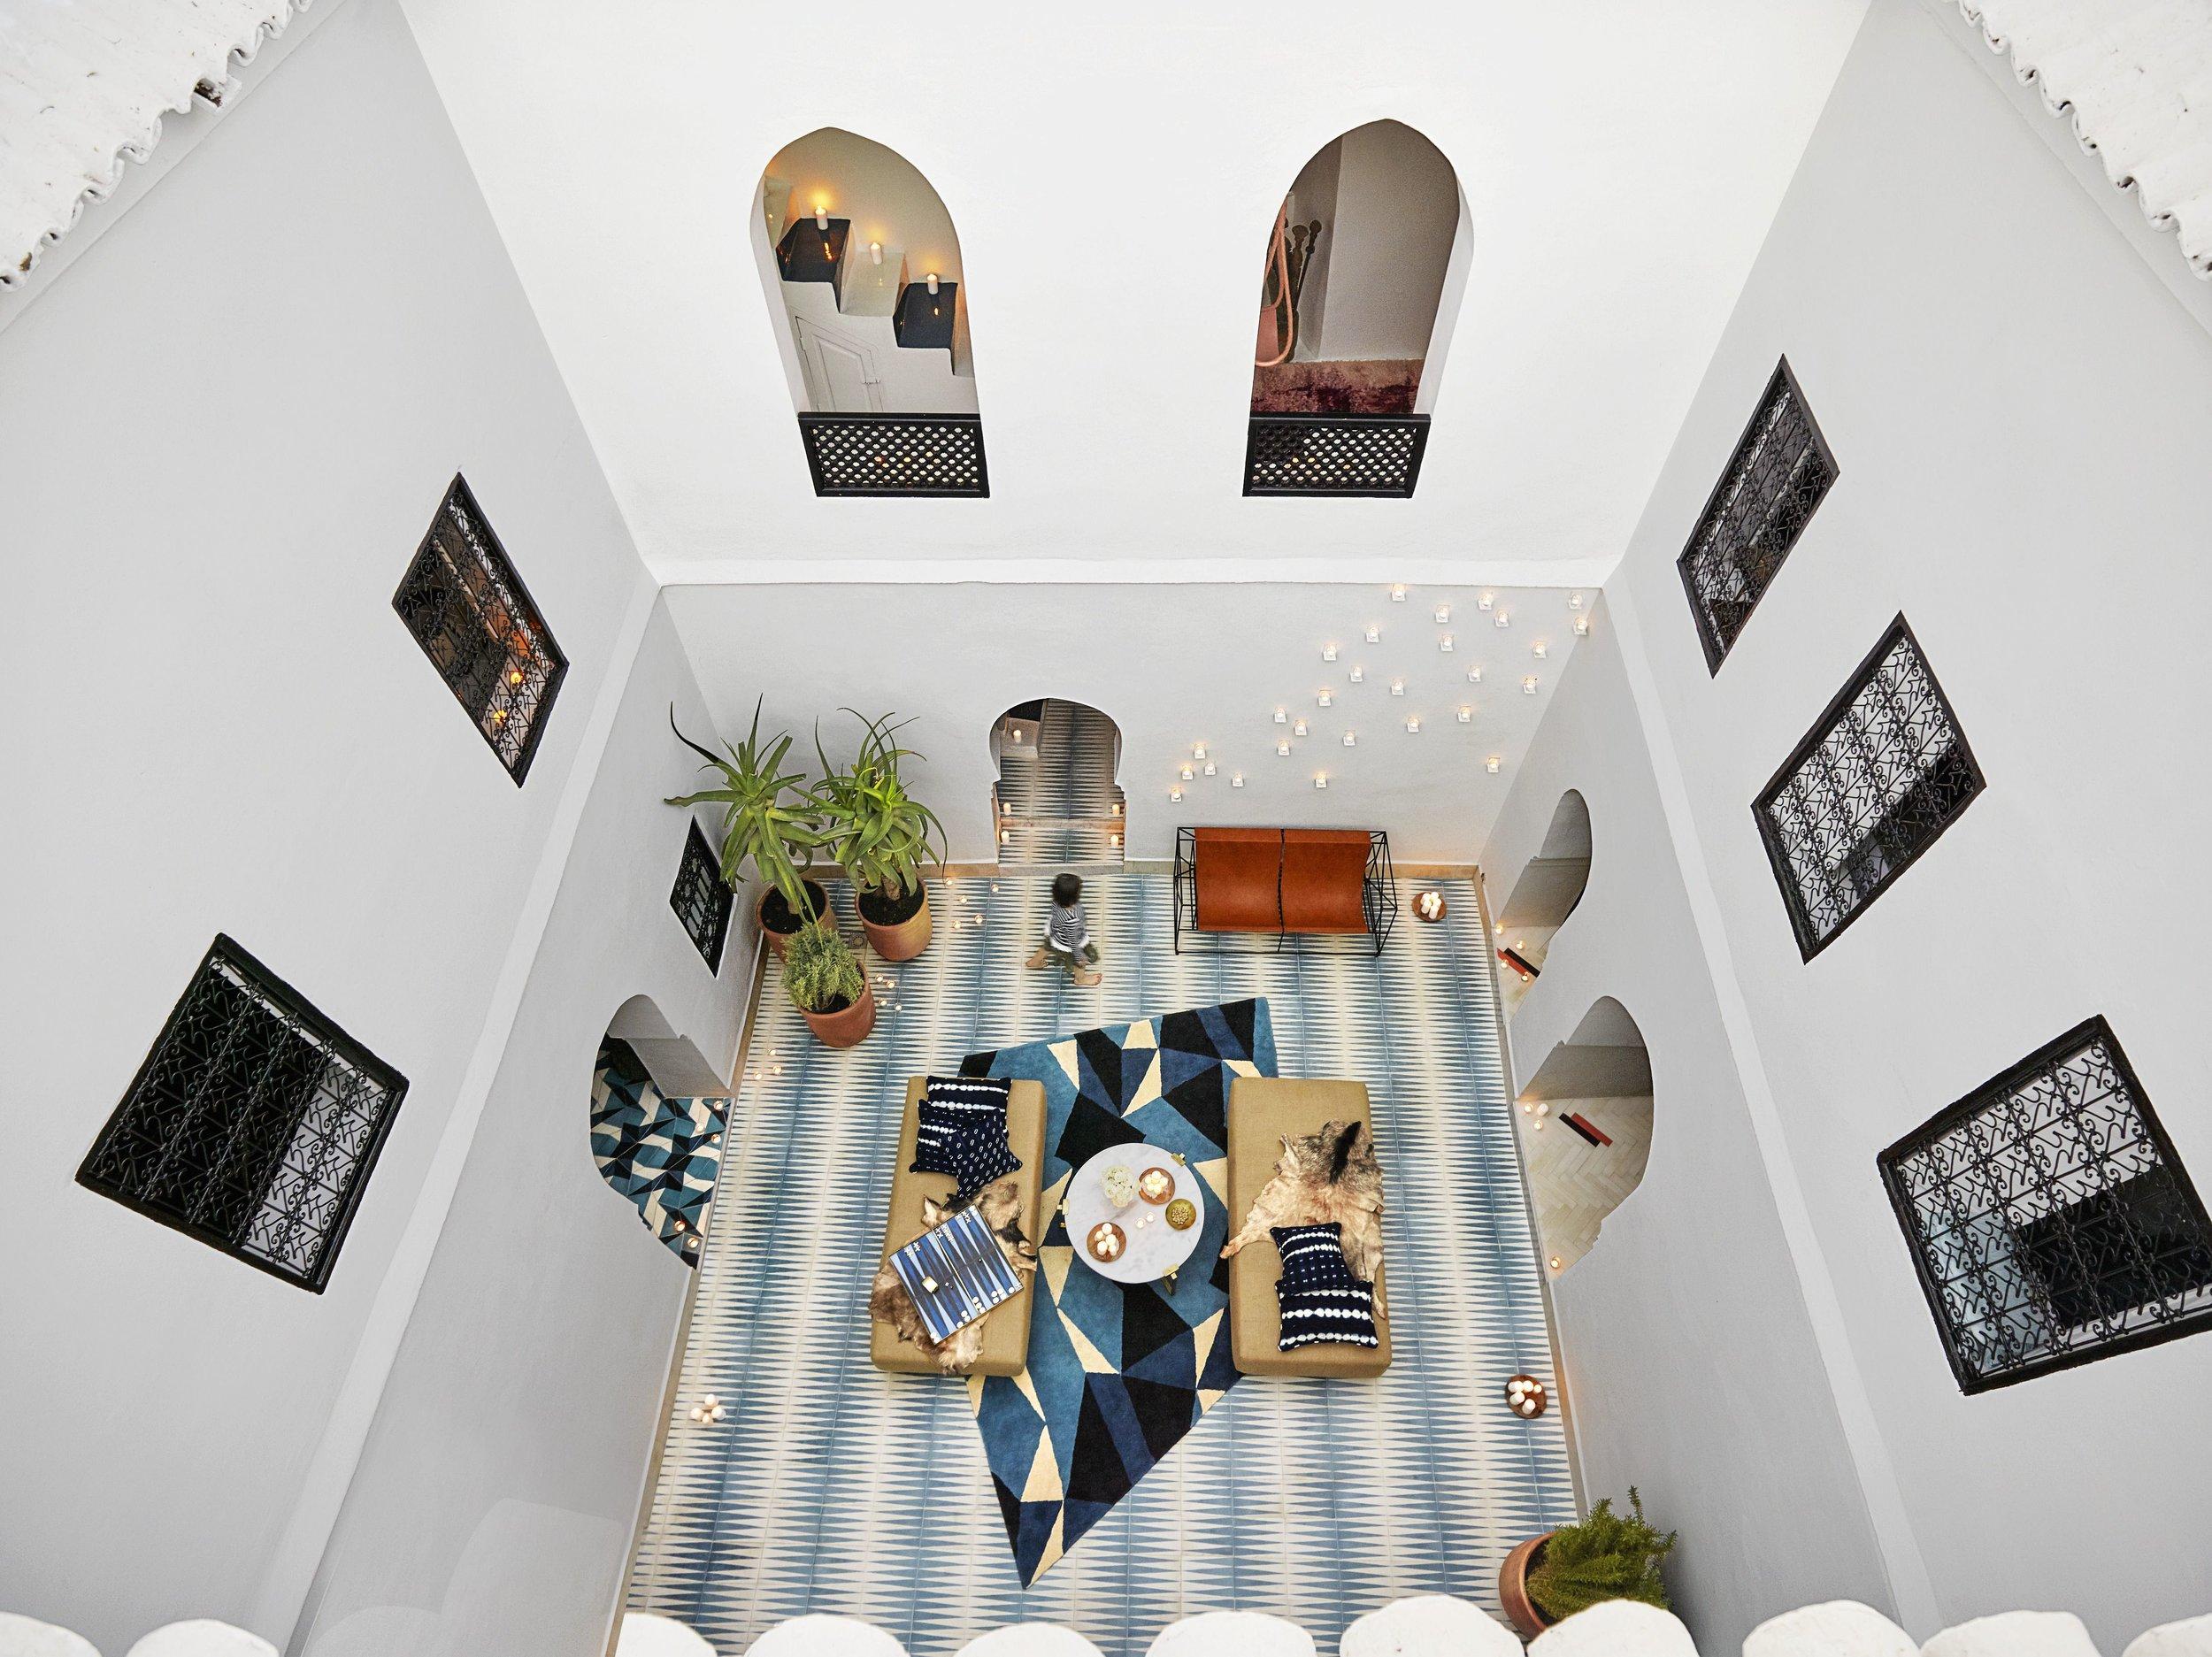 Courtyard - Backgammon tiles